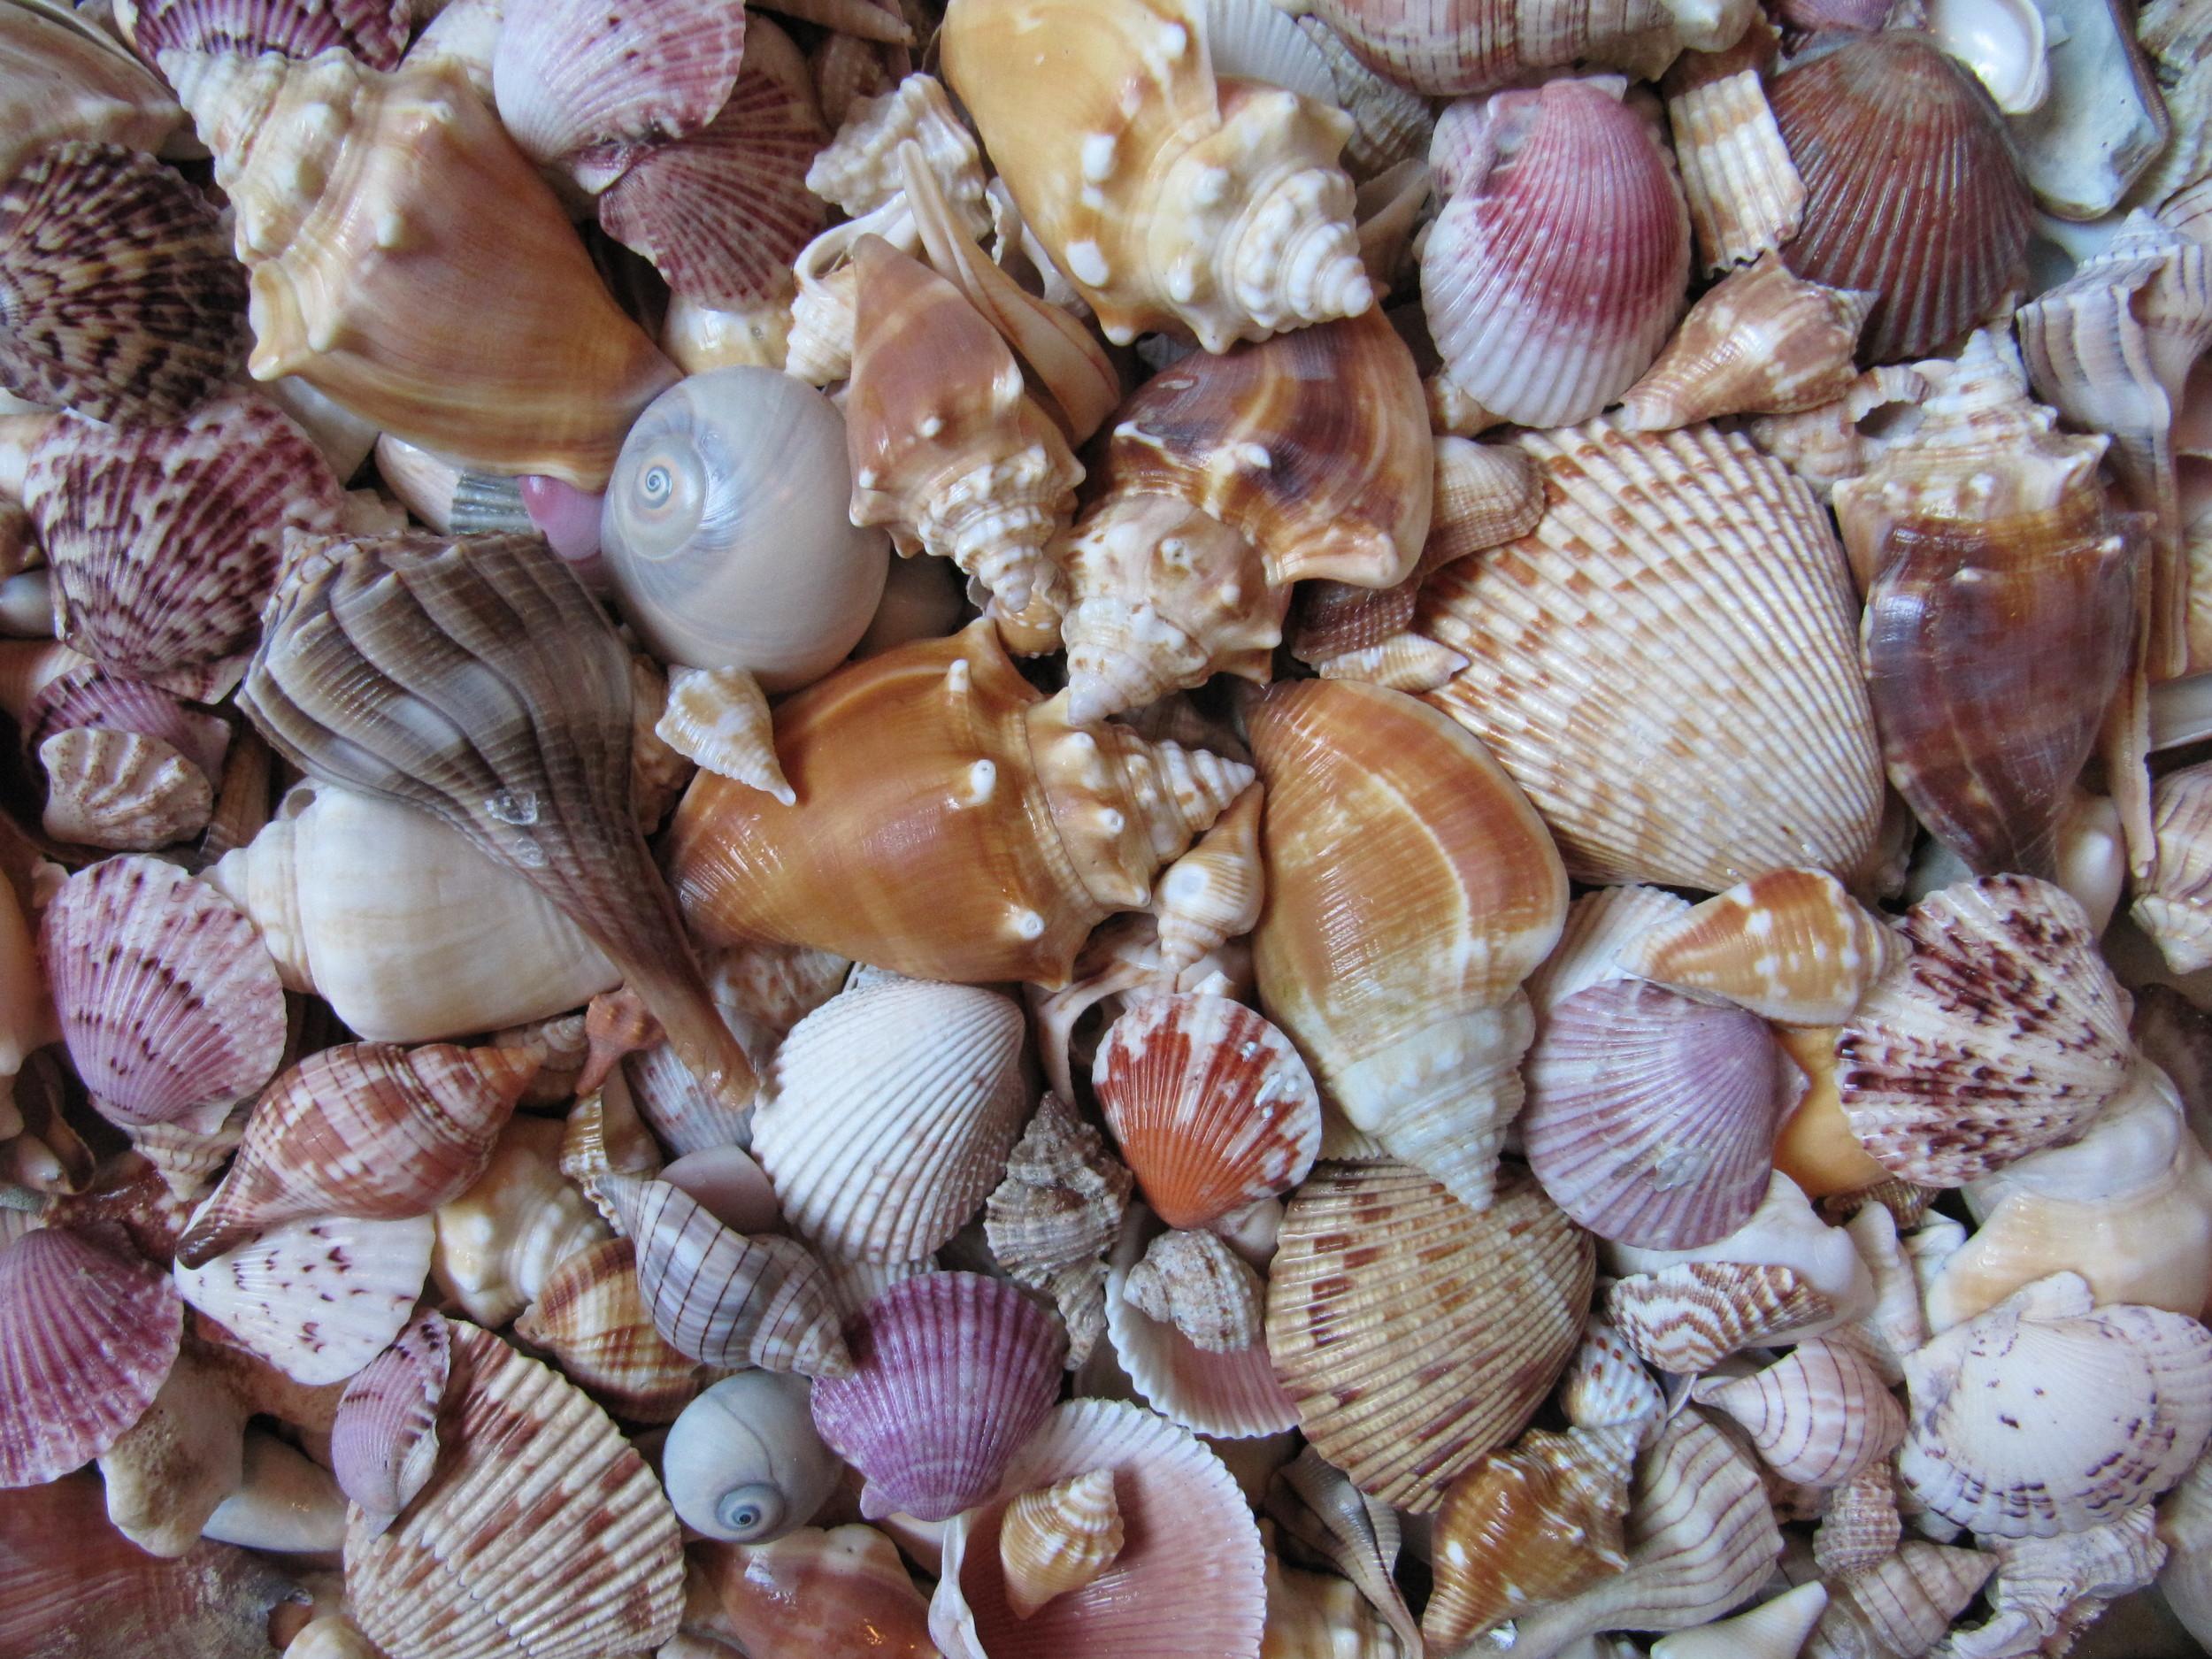 Picking up seashells... Photo credit:www.beachtreasuresandtreasurebeaches.com